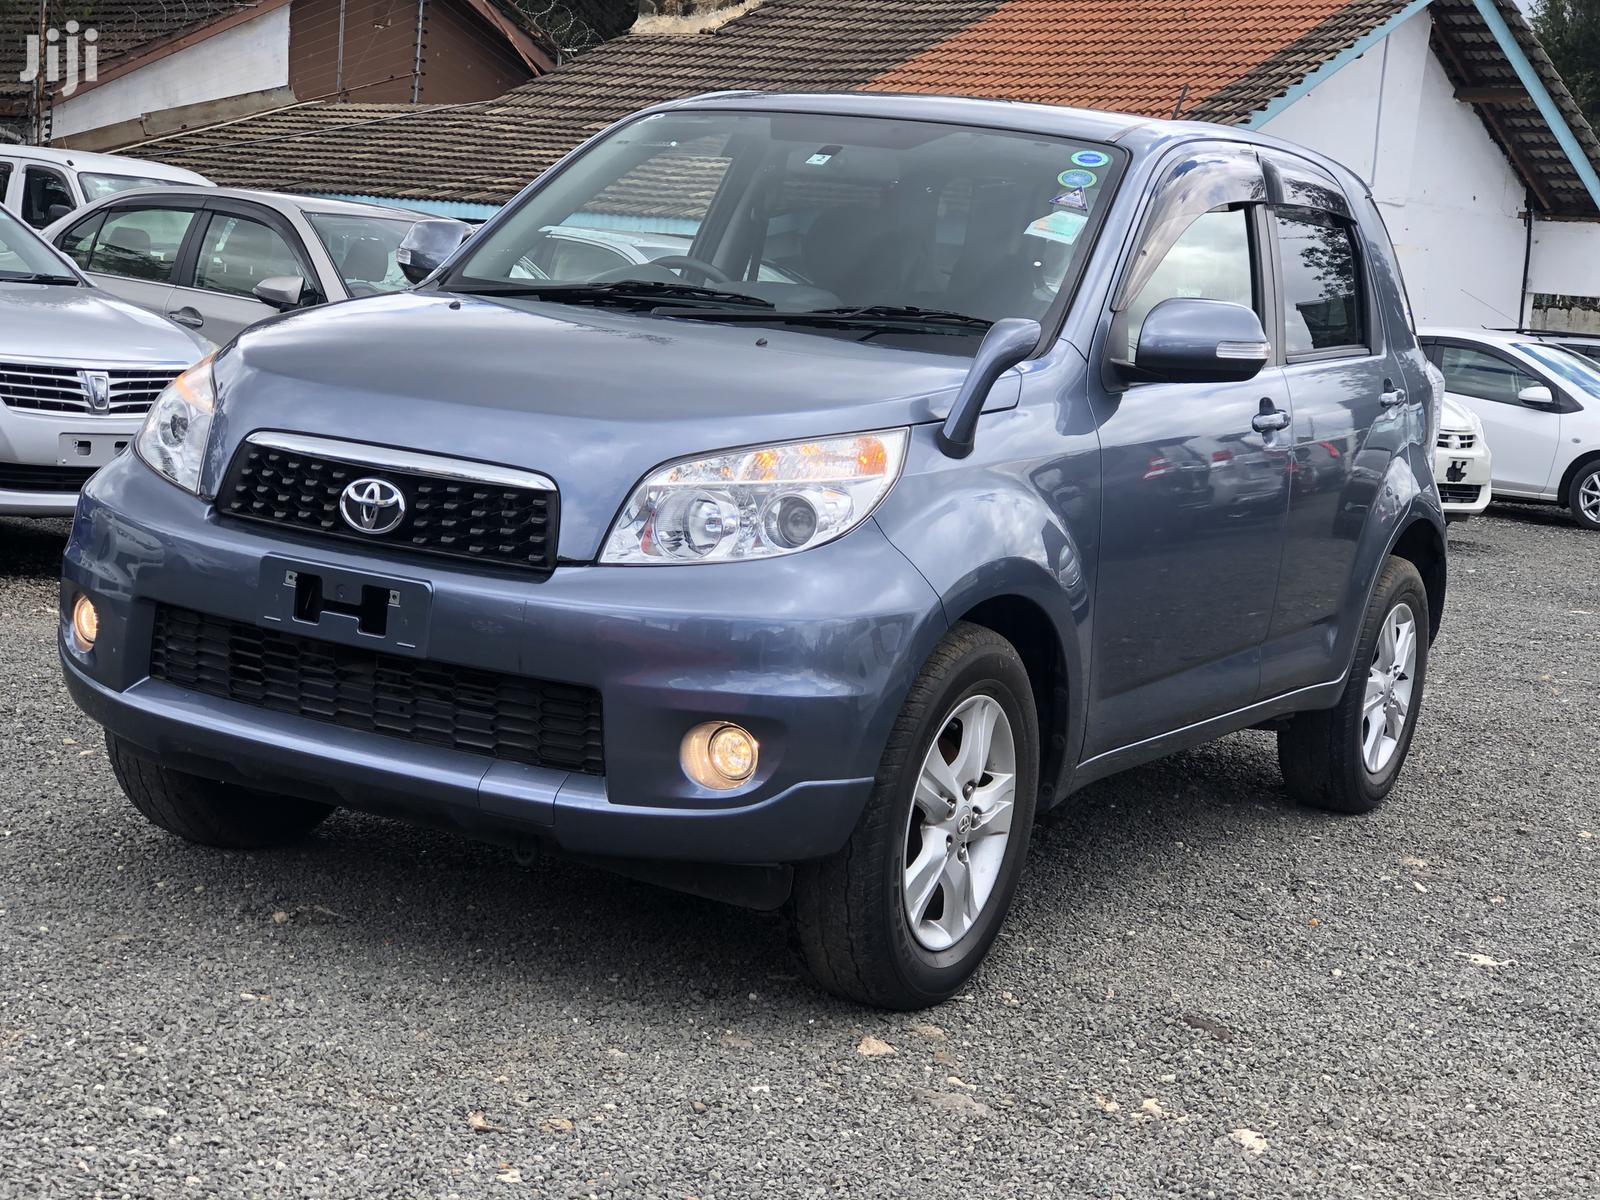 Kelebihan Kekurangan Toyota Rush 2013 Murah Berkualitas